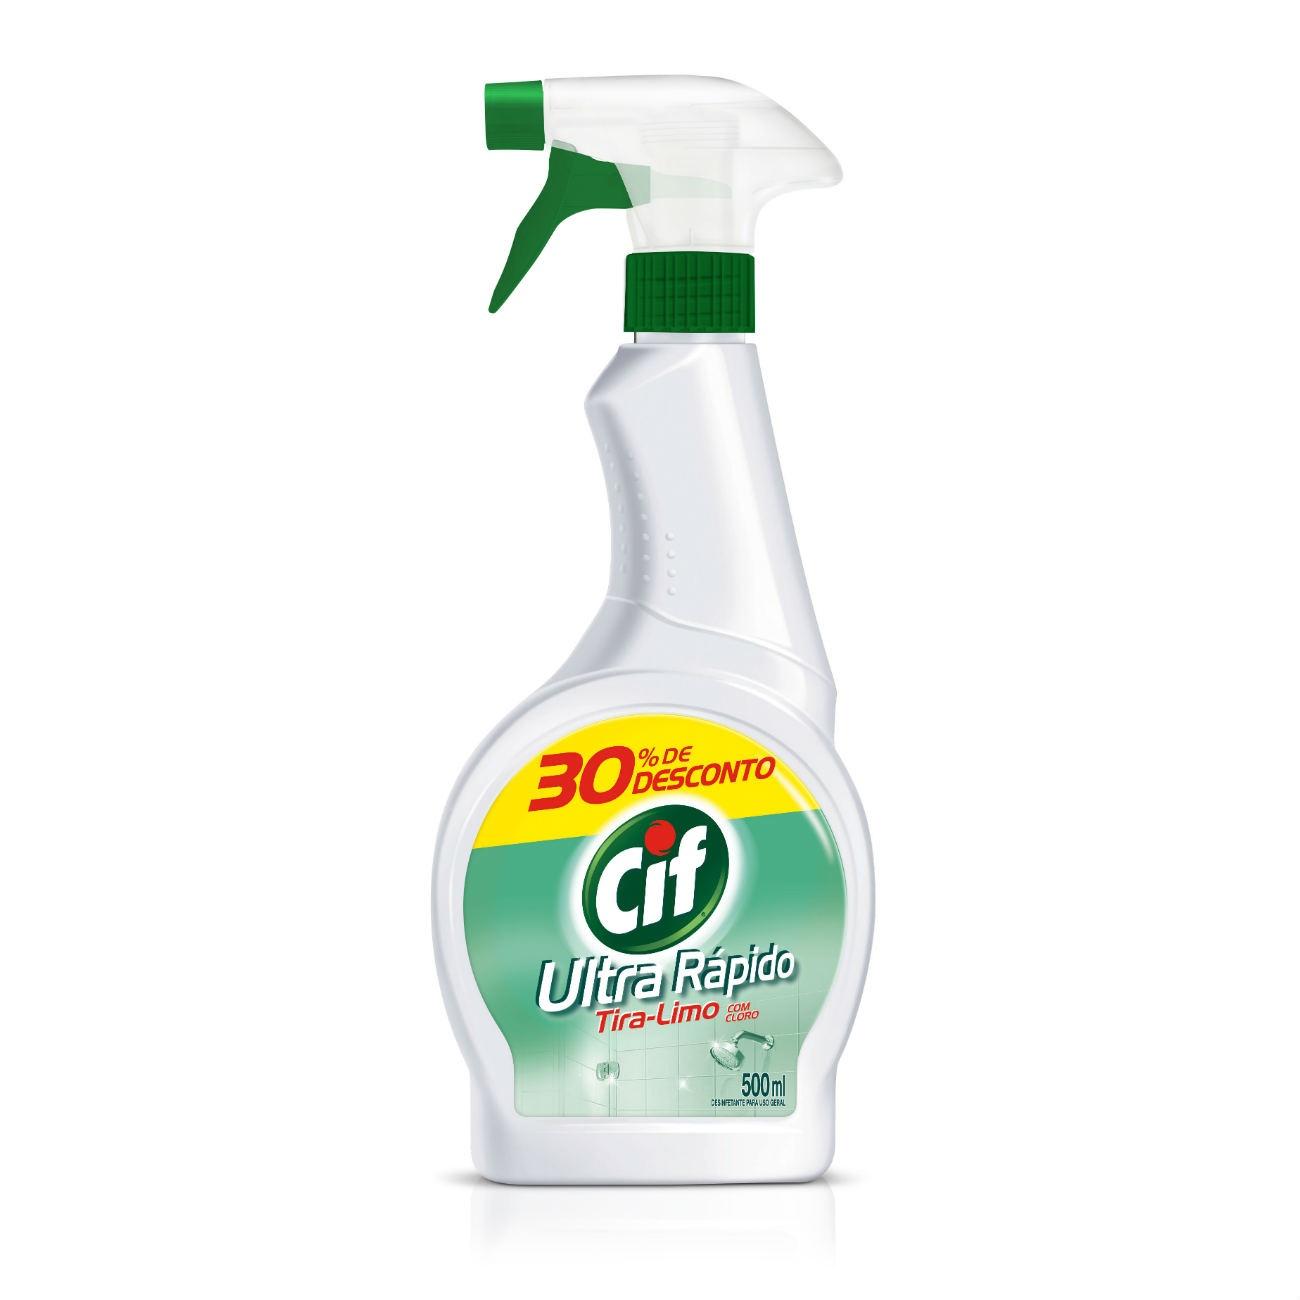 Oferta Limpador CIF Ultra Rápido Tira-Limo Com Cloro Spray 500ml